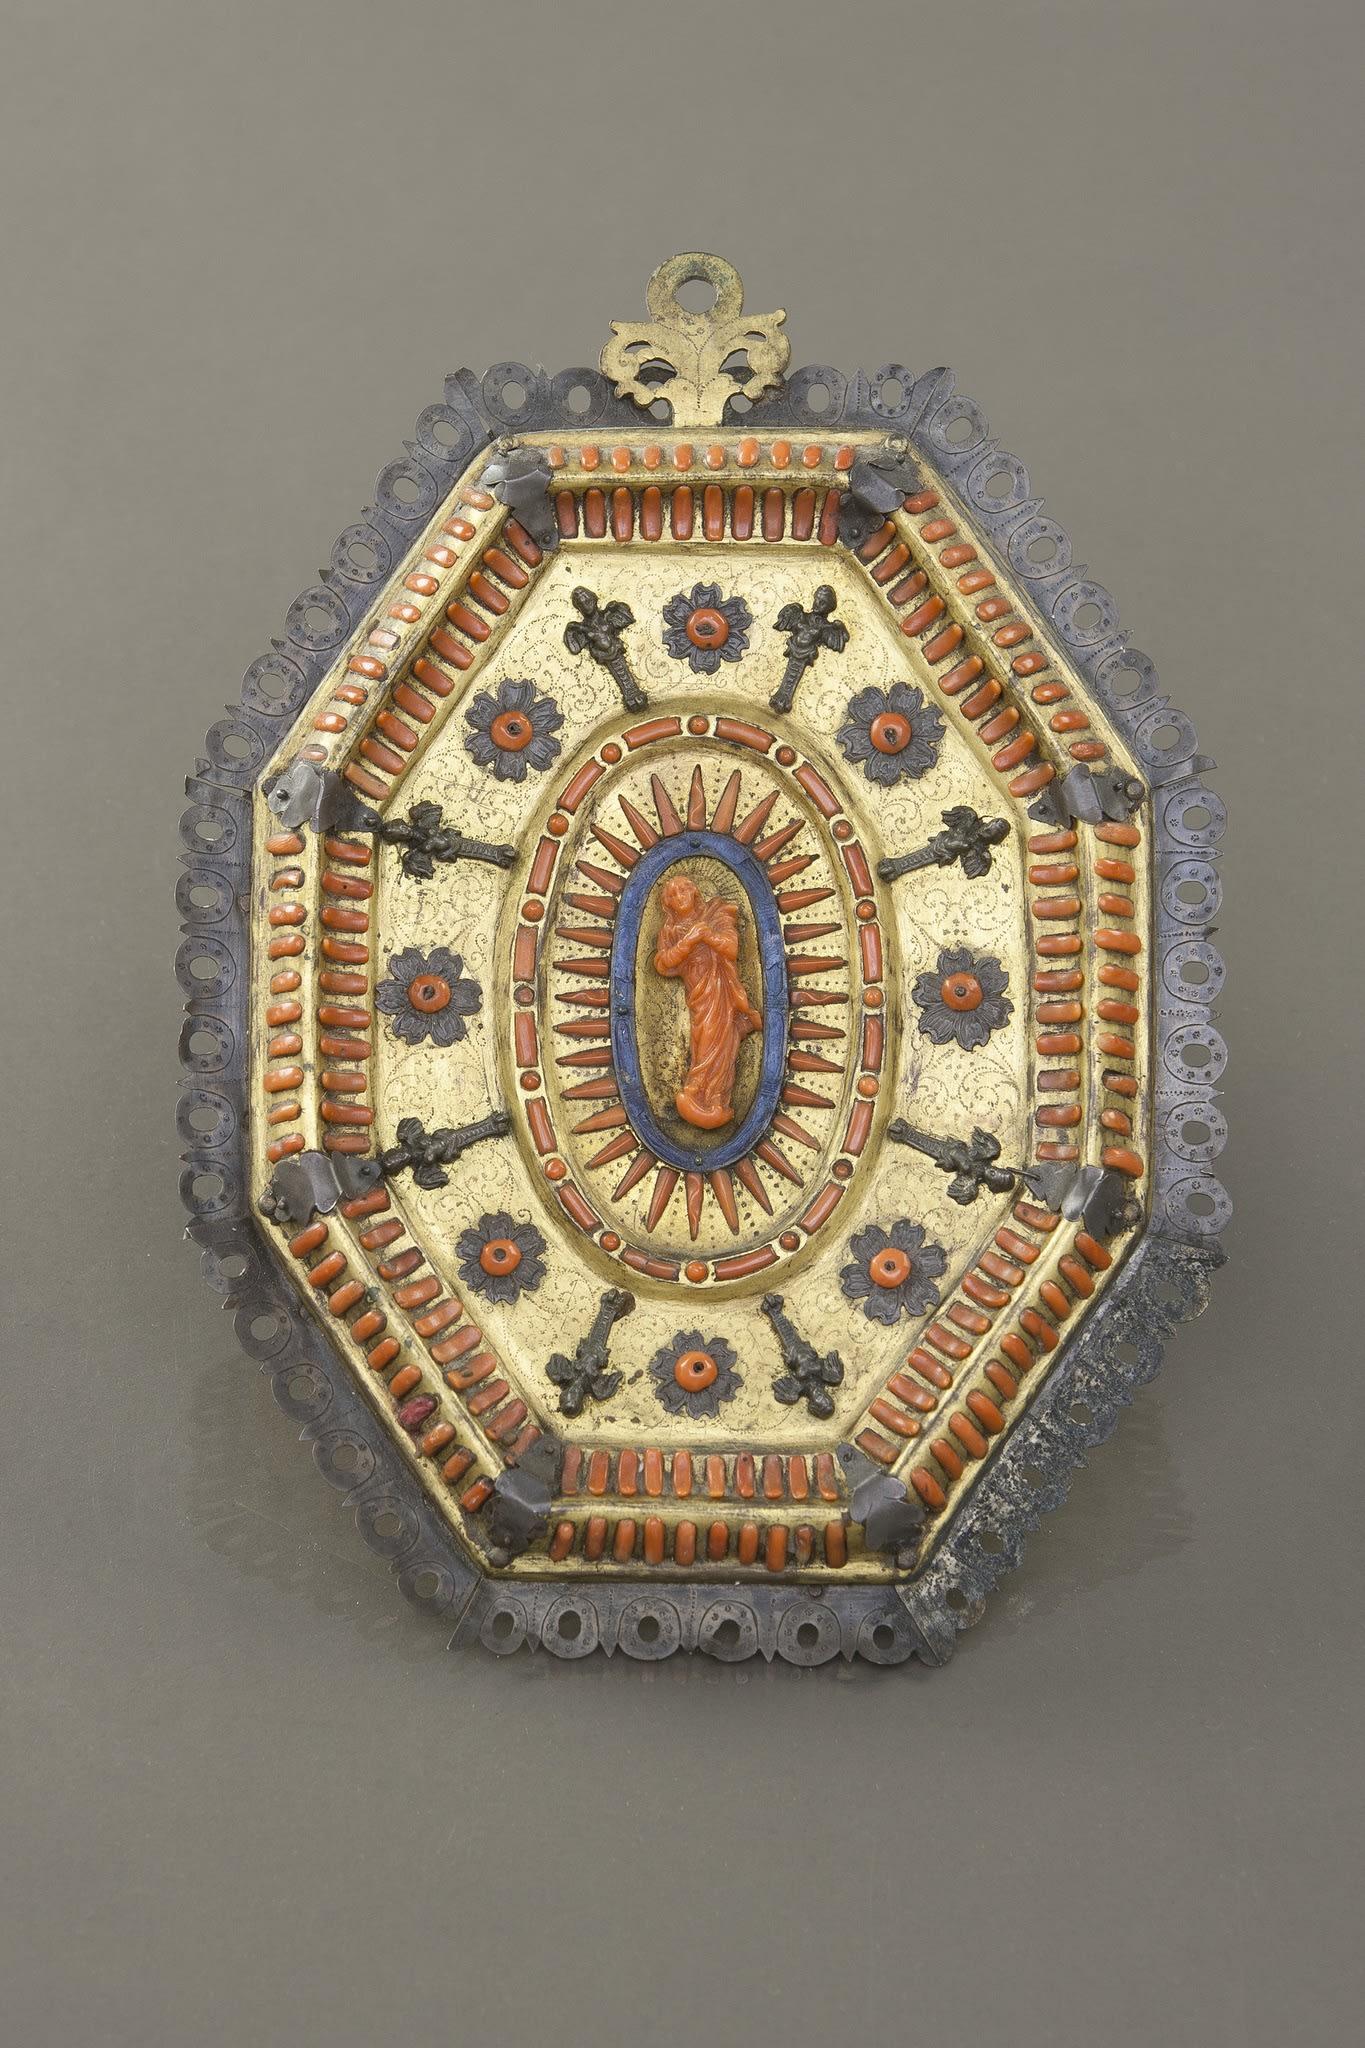 https://artlogic-res.cloudinary.com/w_2400,h_2400,c_limit,f_auto,fl_lossy,q_auto/artlogicstorage/brunfineart/images/view/d9c07b31659798ba4fa7c6a4827daf558536c807/brunfineart-trapani-pair-of-plaques-17th-century.jpg